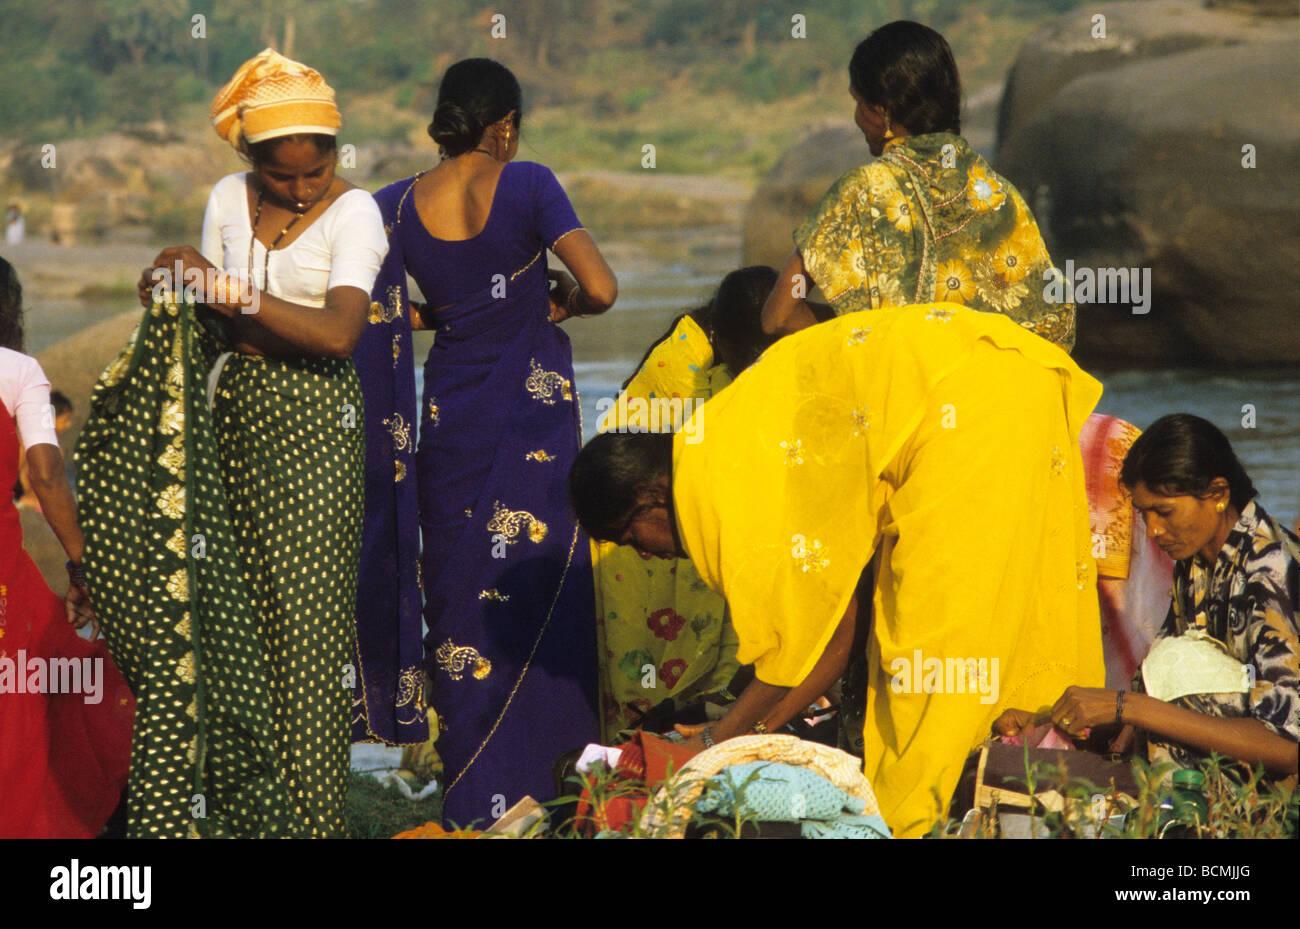 Unique Dressing Style For Karnataka Marriage  Fashion  Pinterest